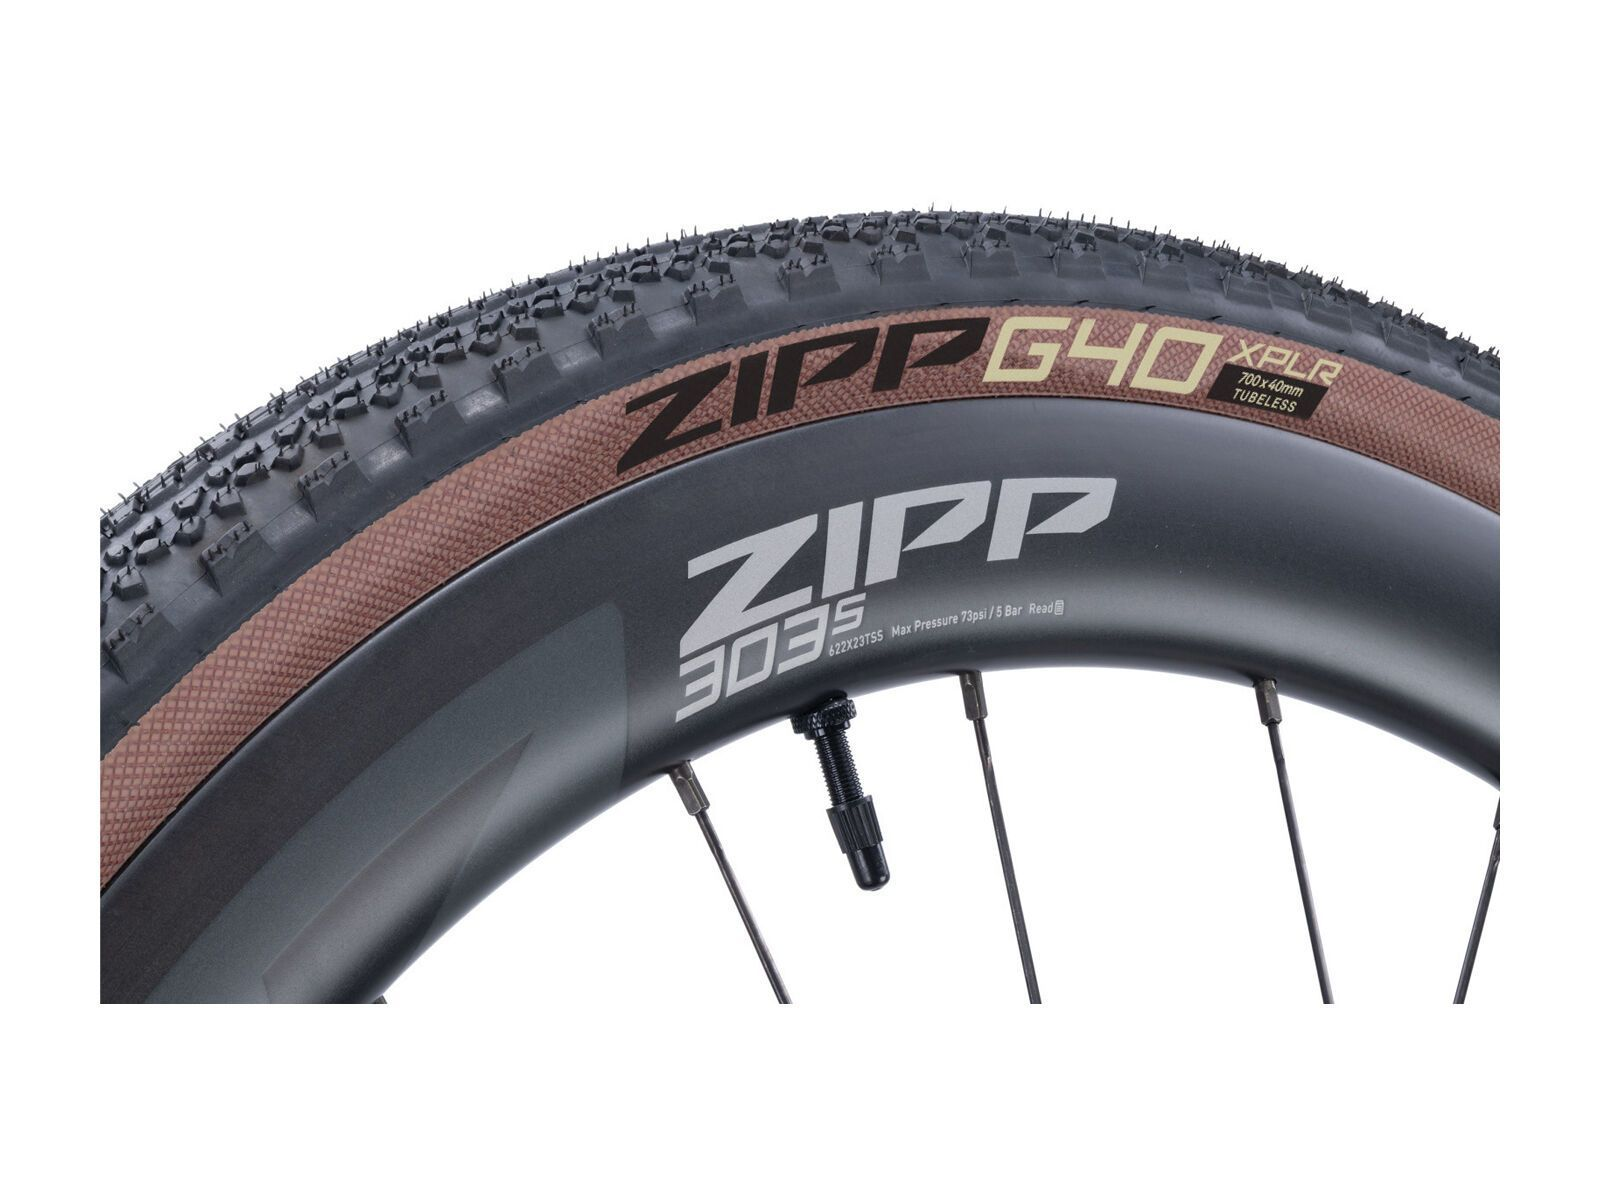 Zipp G40 XPLR - 700C tan sidewall 700x40C 622000012